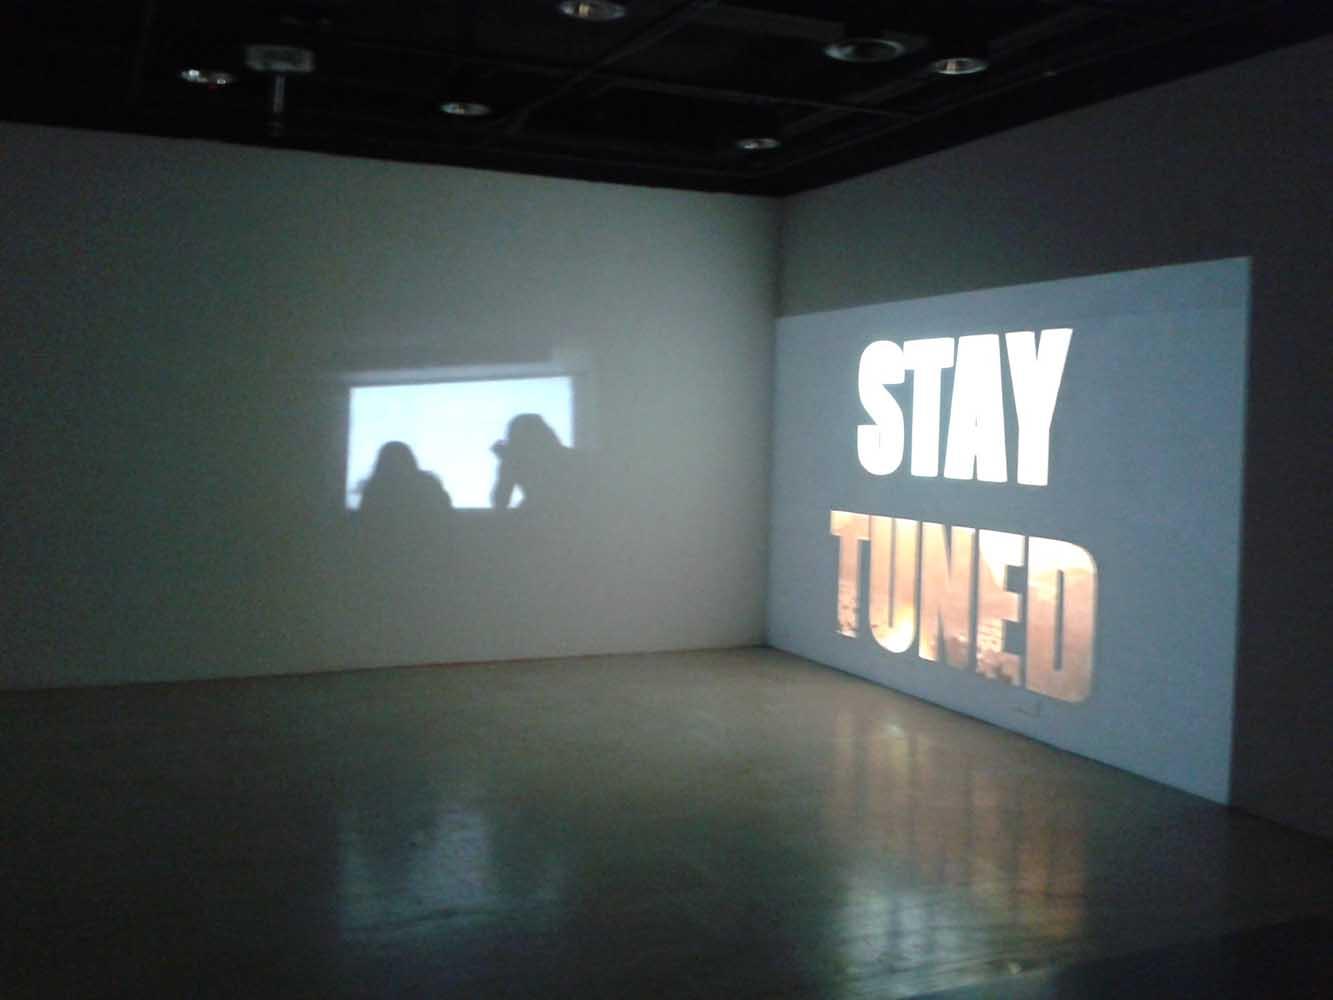 vue de l'installation vidéo